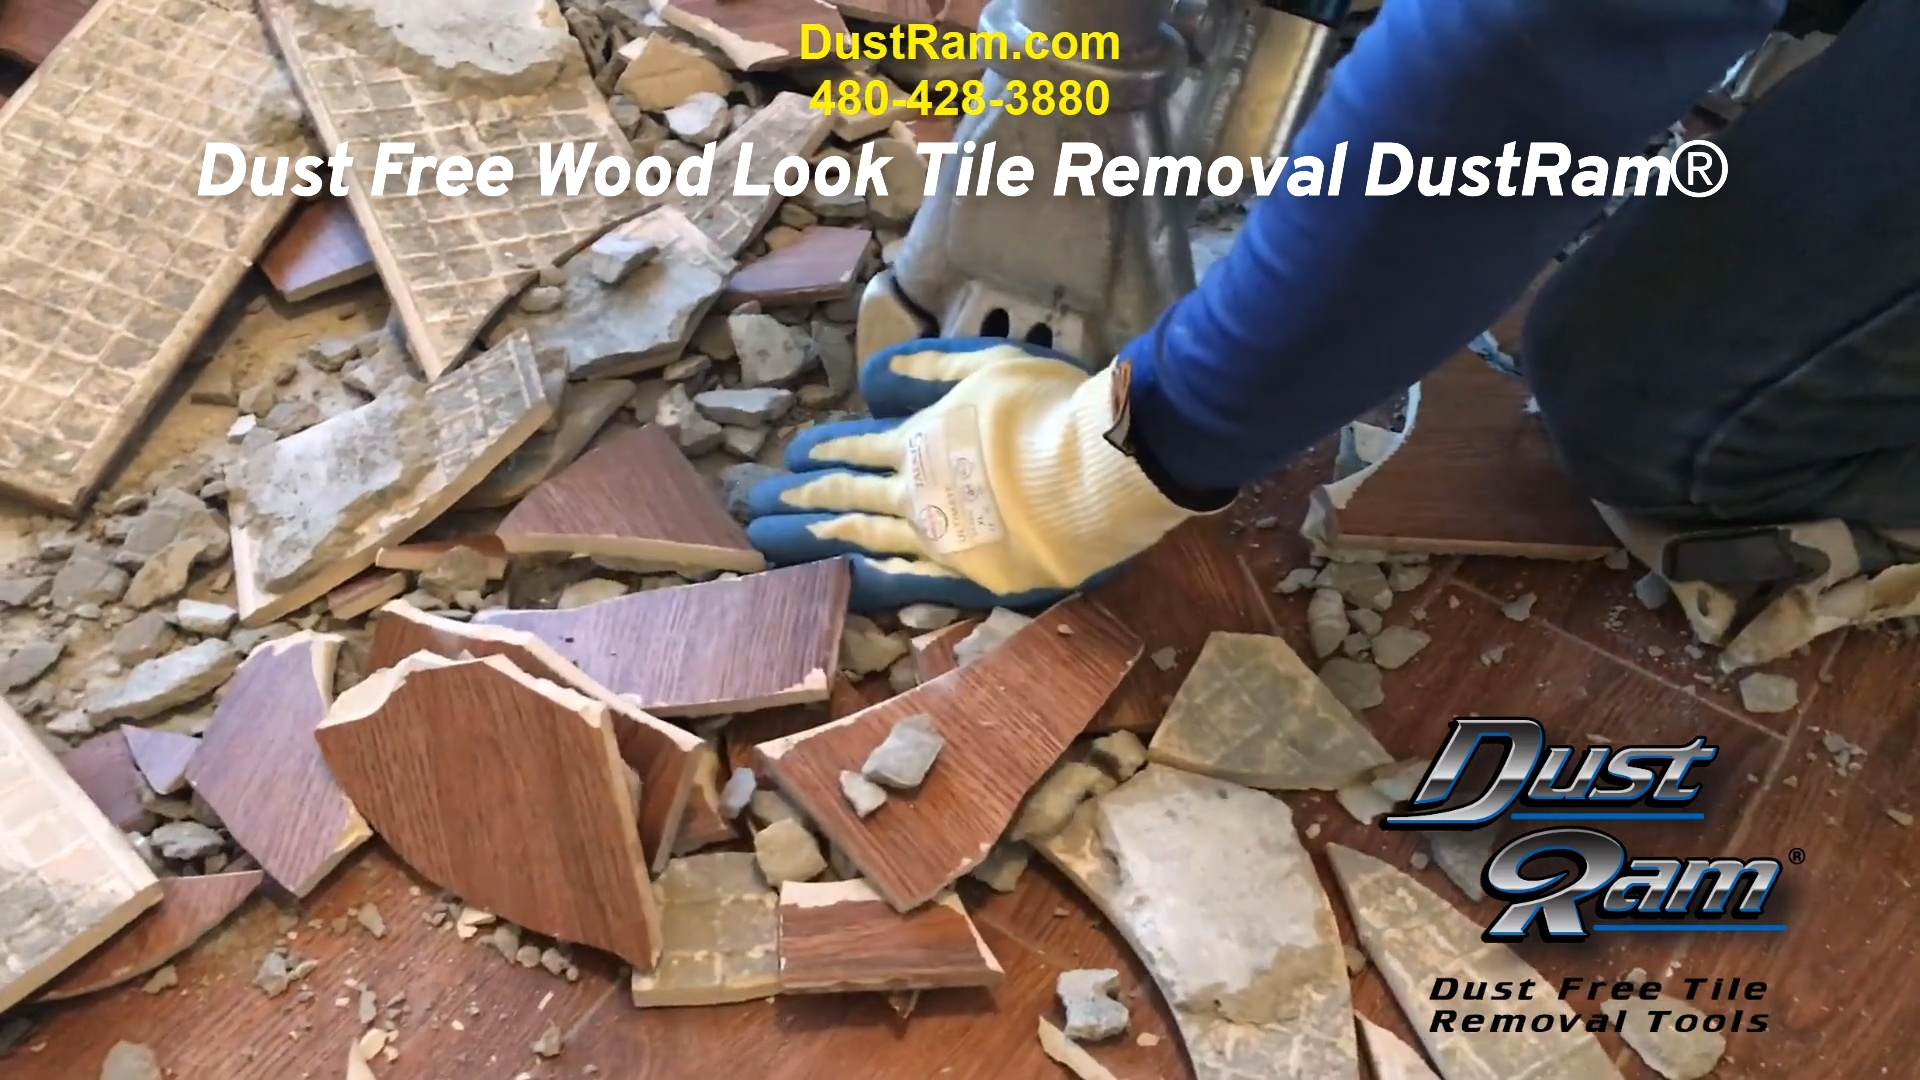 dust free wood look tile removal dustram